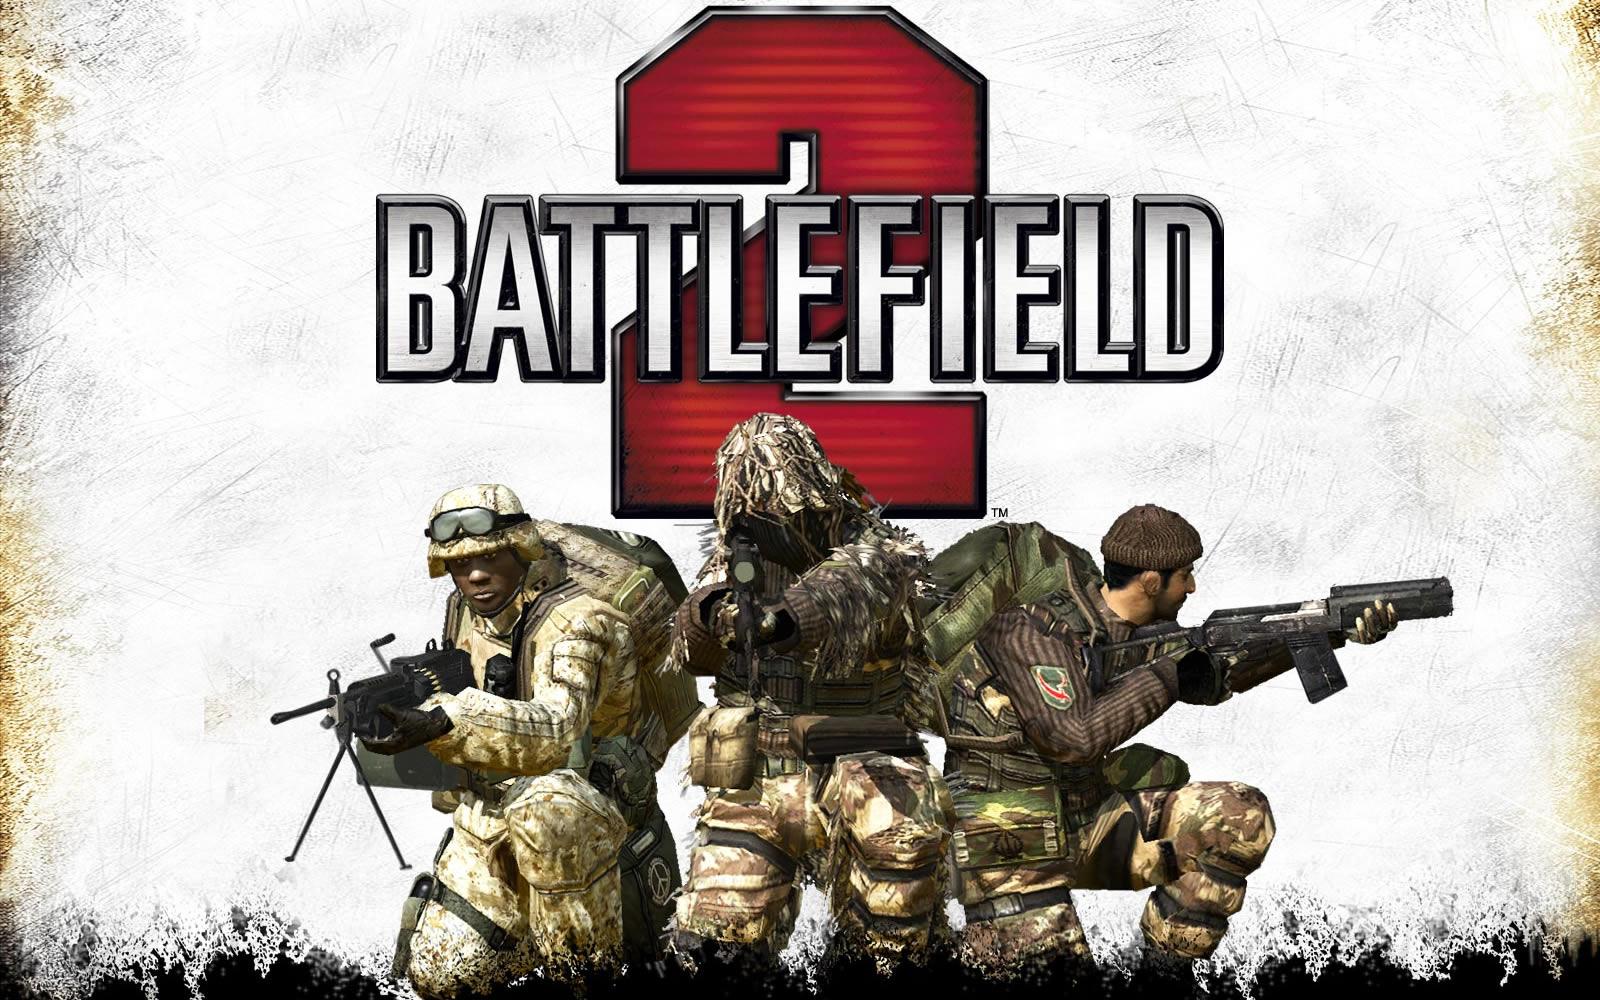 Battlefield 2: O clássico que ainda vive